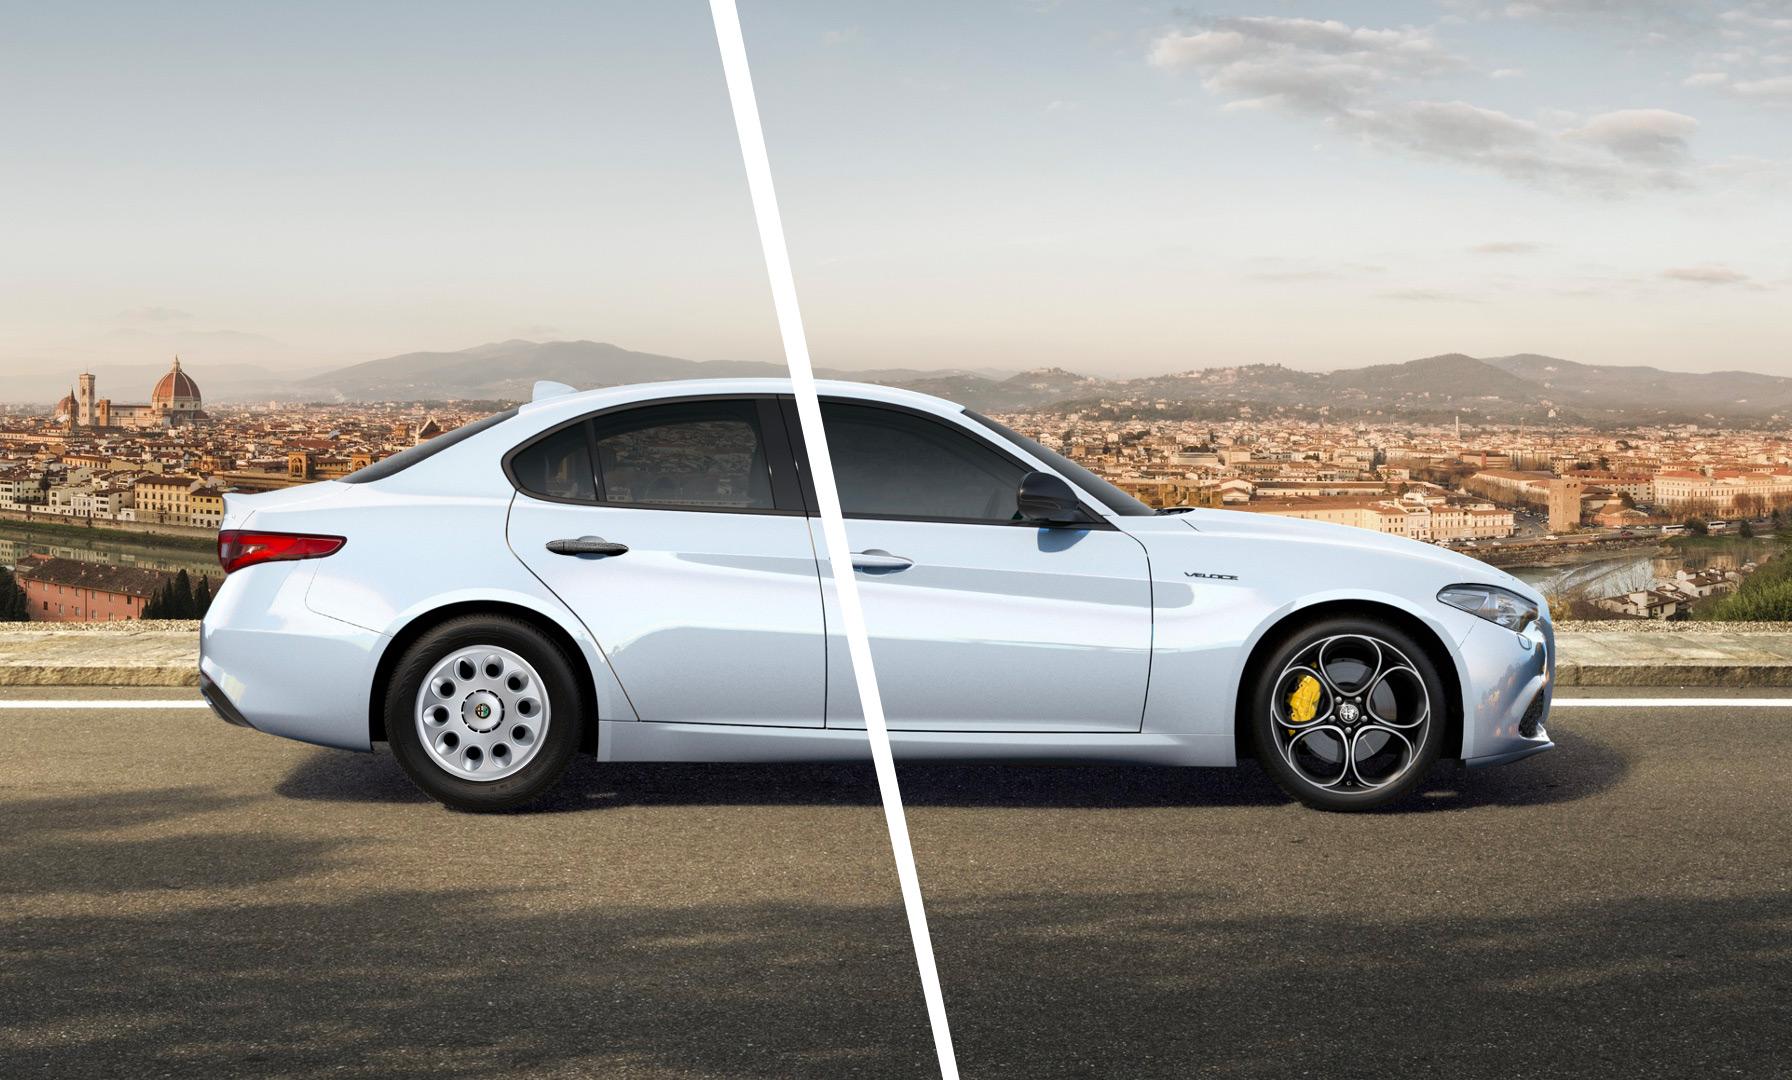 Alfa Romeo stratégie low cost